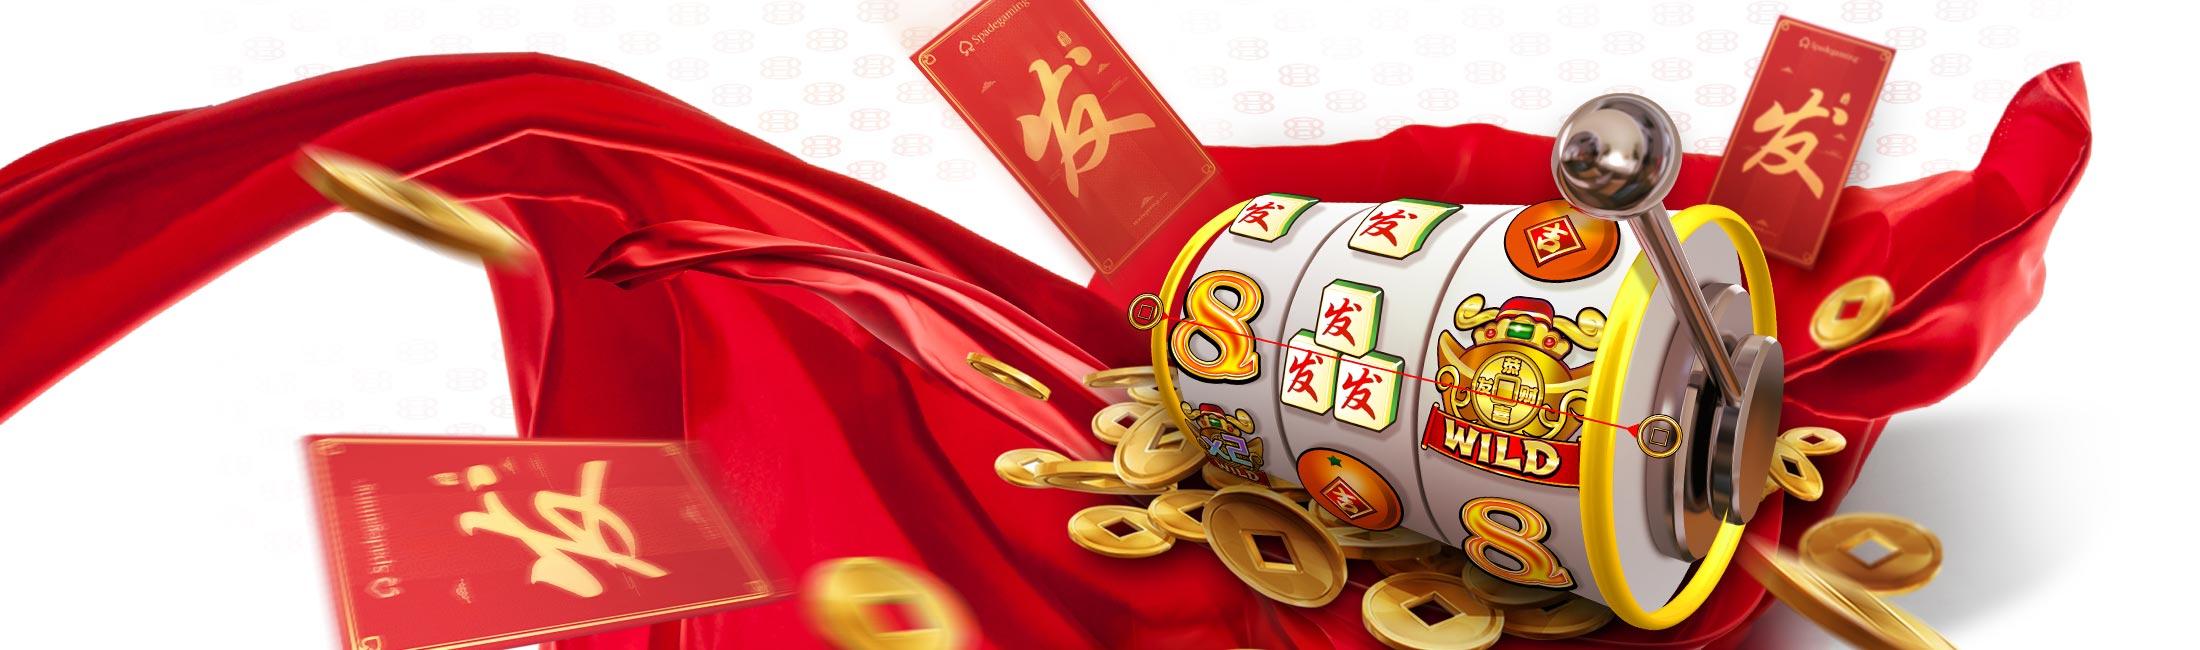 spadegaming online casino review